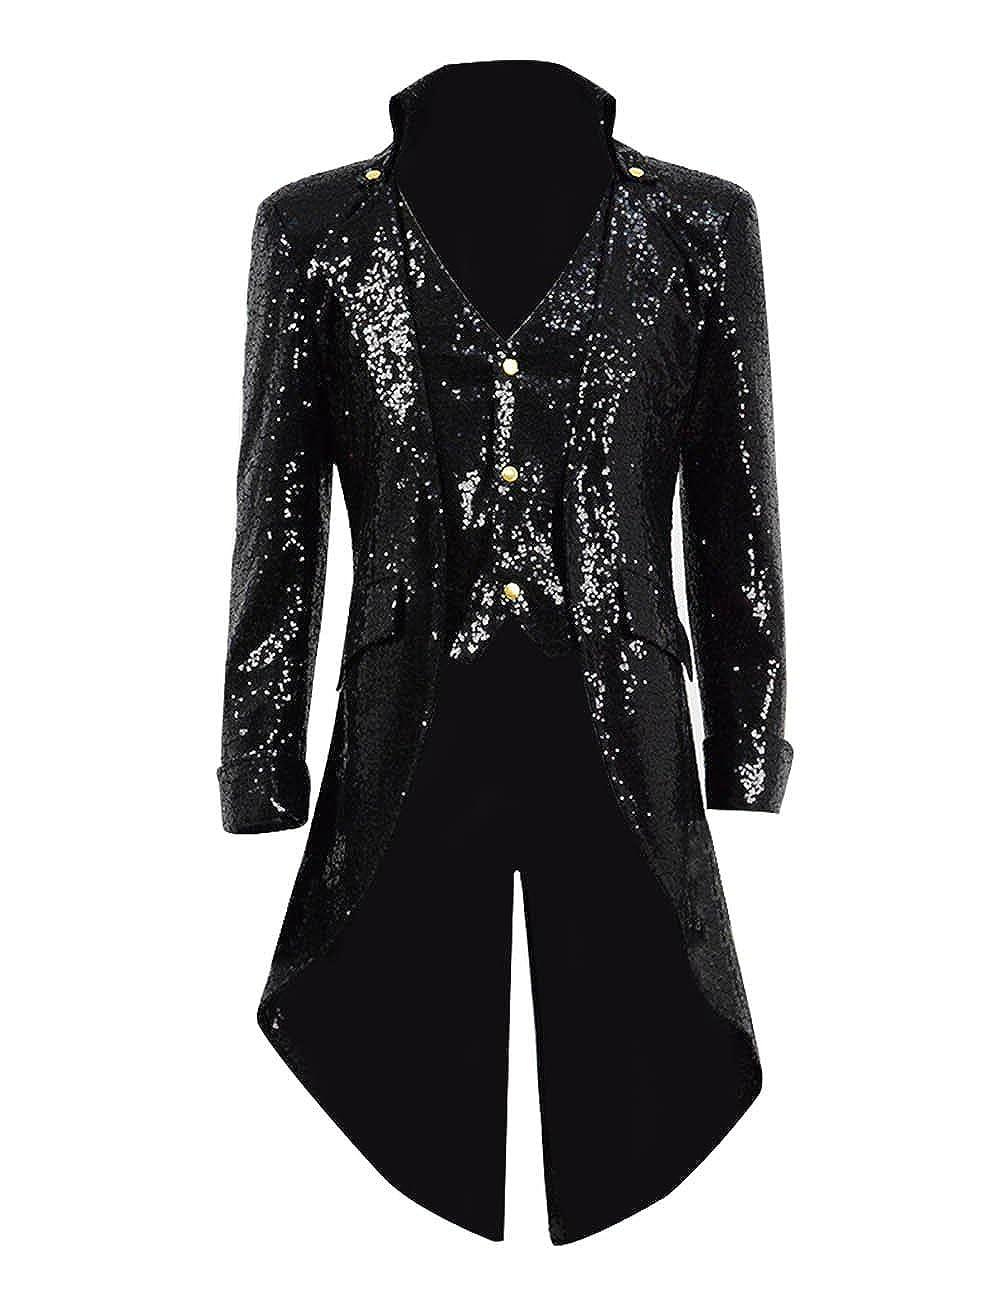 TISEA Mens PU Leather Woolen Faux-Suede Sequin Gothic Tailcoat Jacket Steampunk VTG Victorian Coat